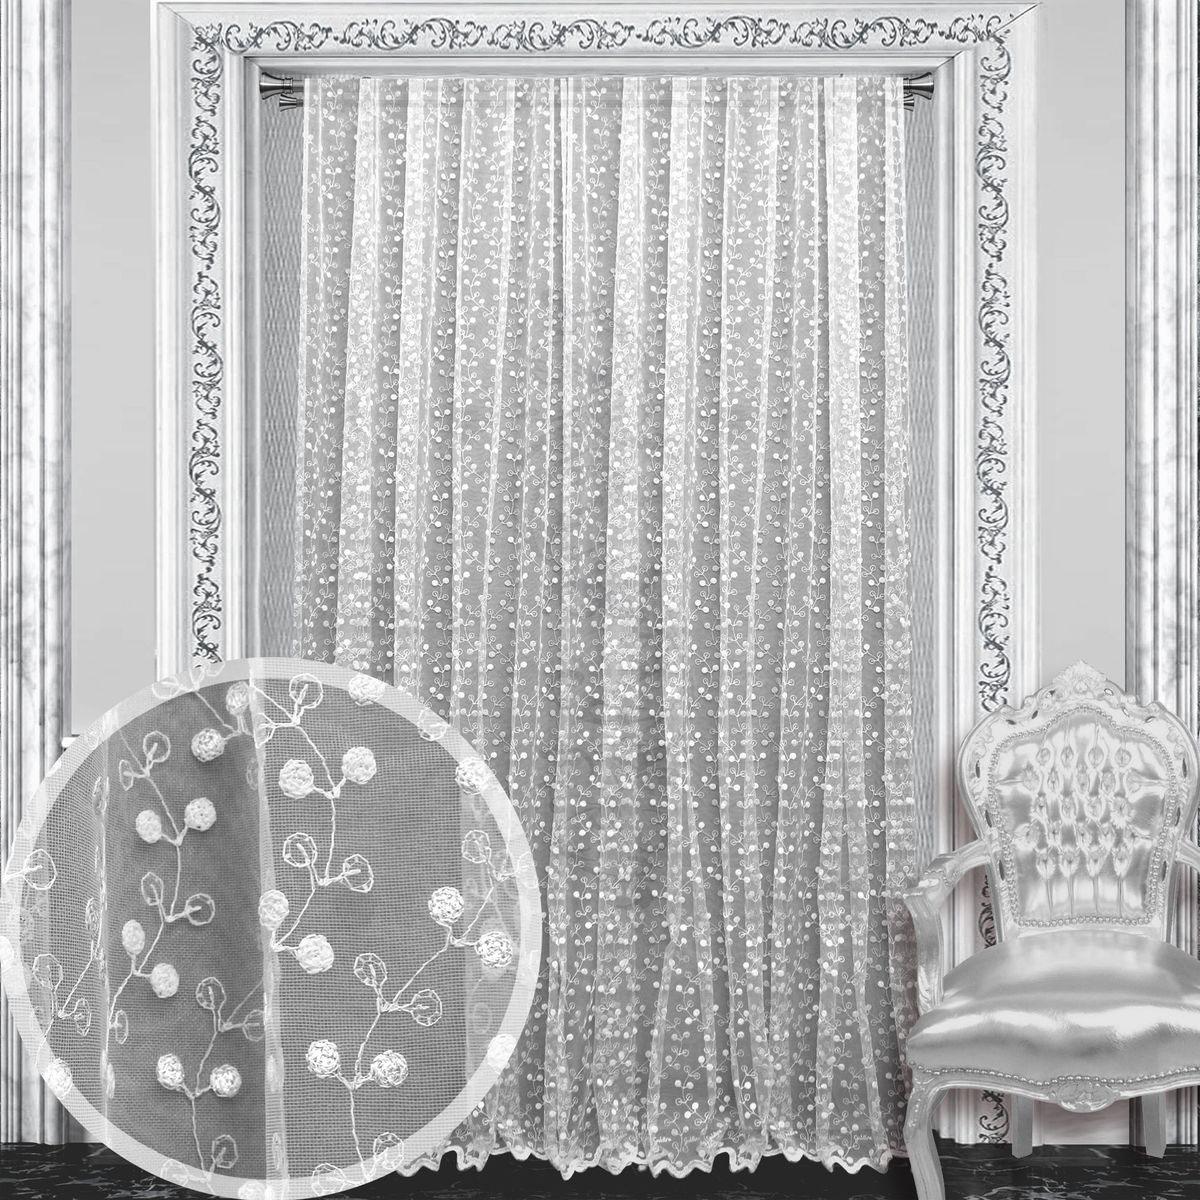 Тюль Amore Mio, 300 х 270 см, 1 шт., цвет: белый. 8611286112